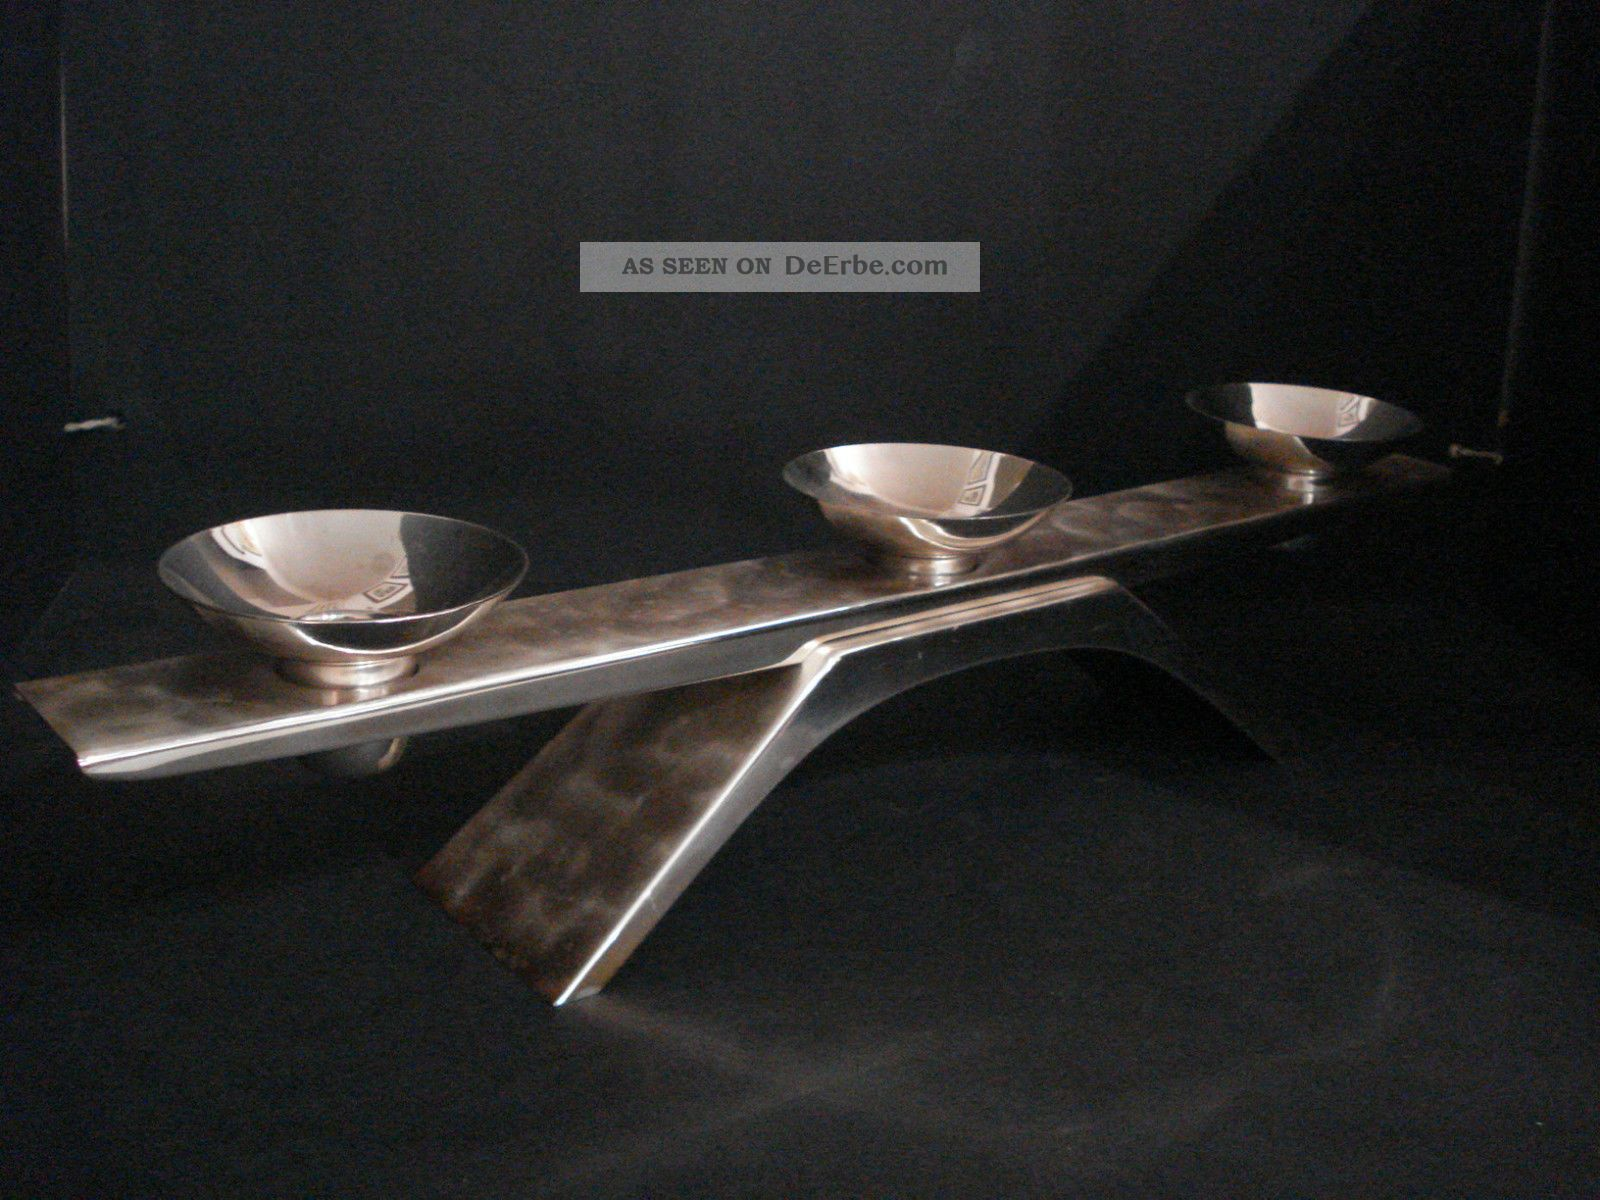 wmf ikora kerzenhalter versilberter kerzenst nder art deco bienenkorb turm. Black Bedroom Furniture Sets. Home Design Ideas